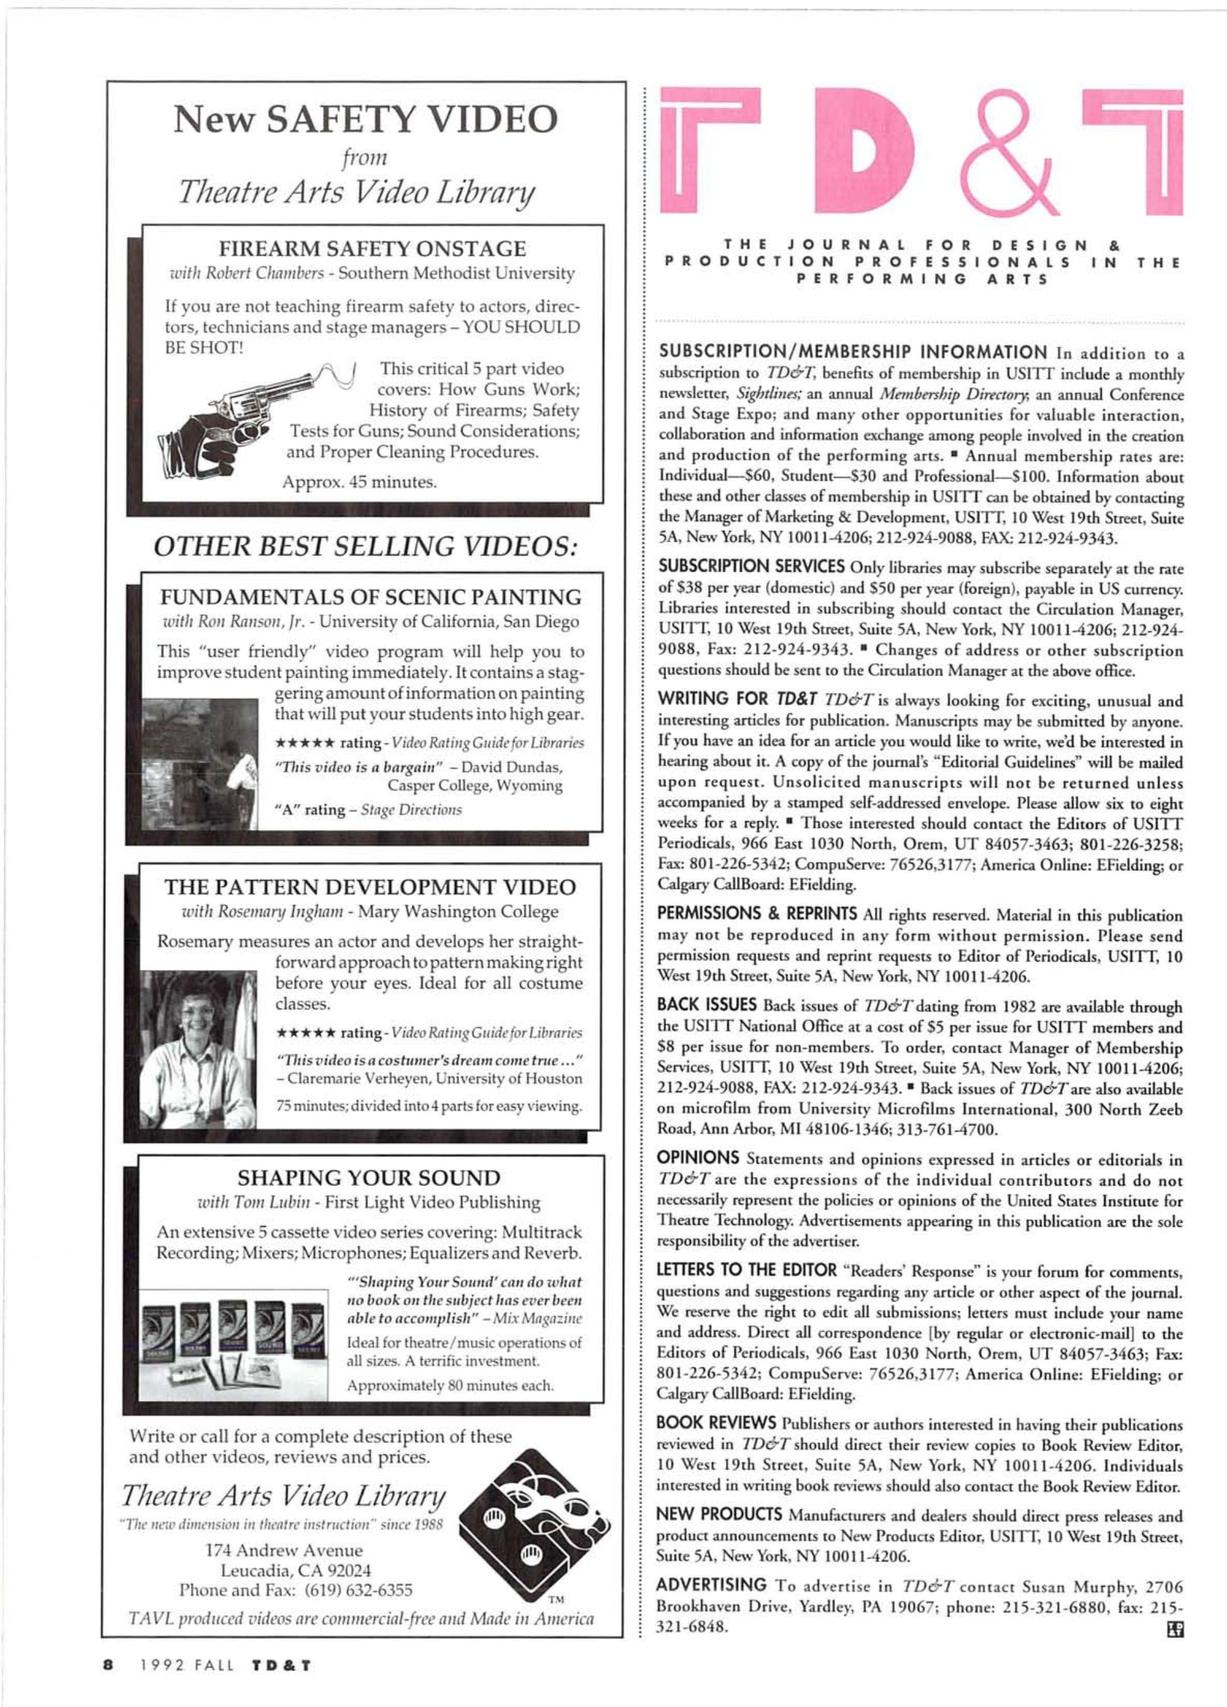 Theatre Design & Technology - Fall 1992